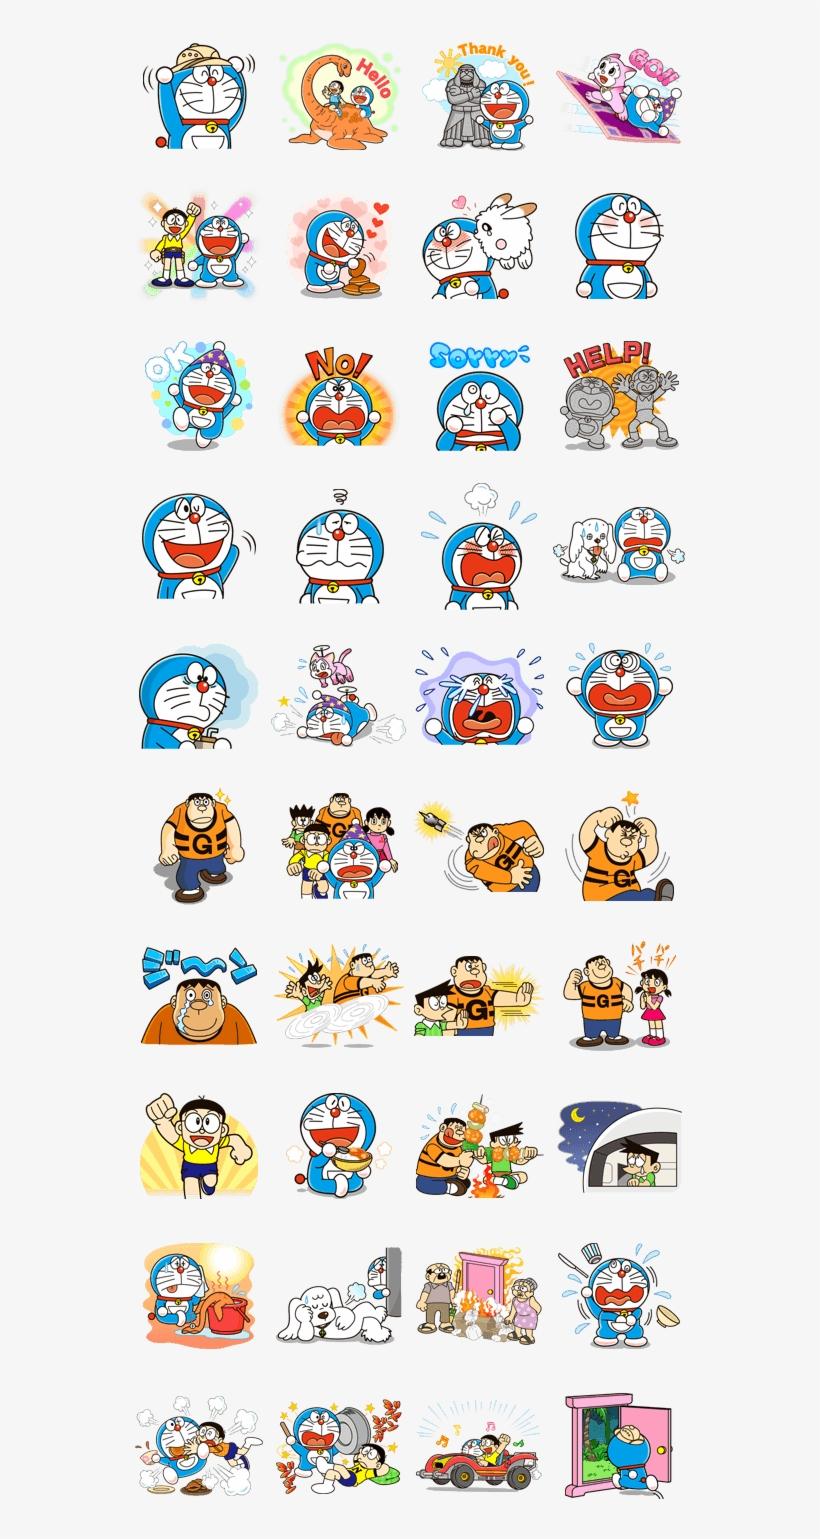 doraemon the adventure by fujiko pro doraemon printable stickers